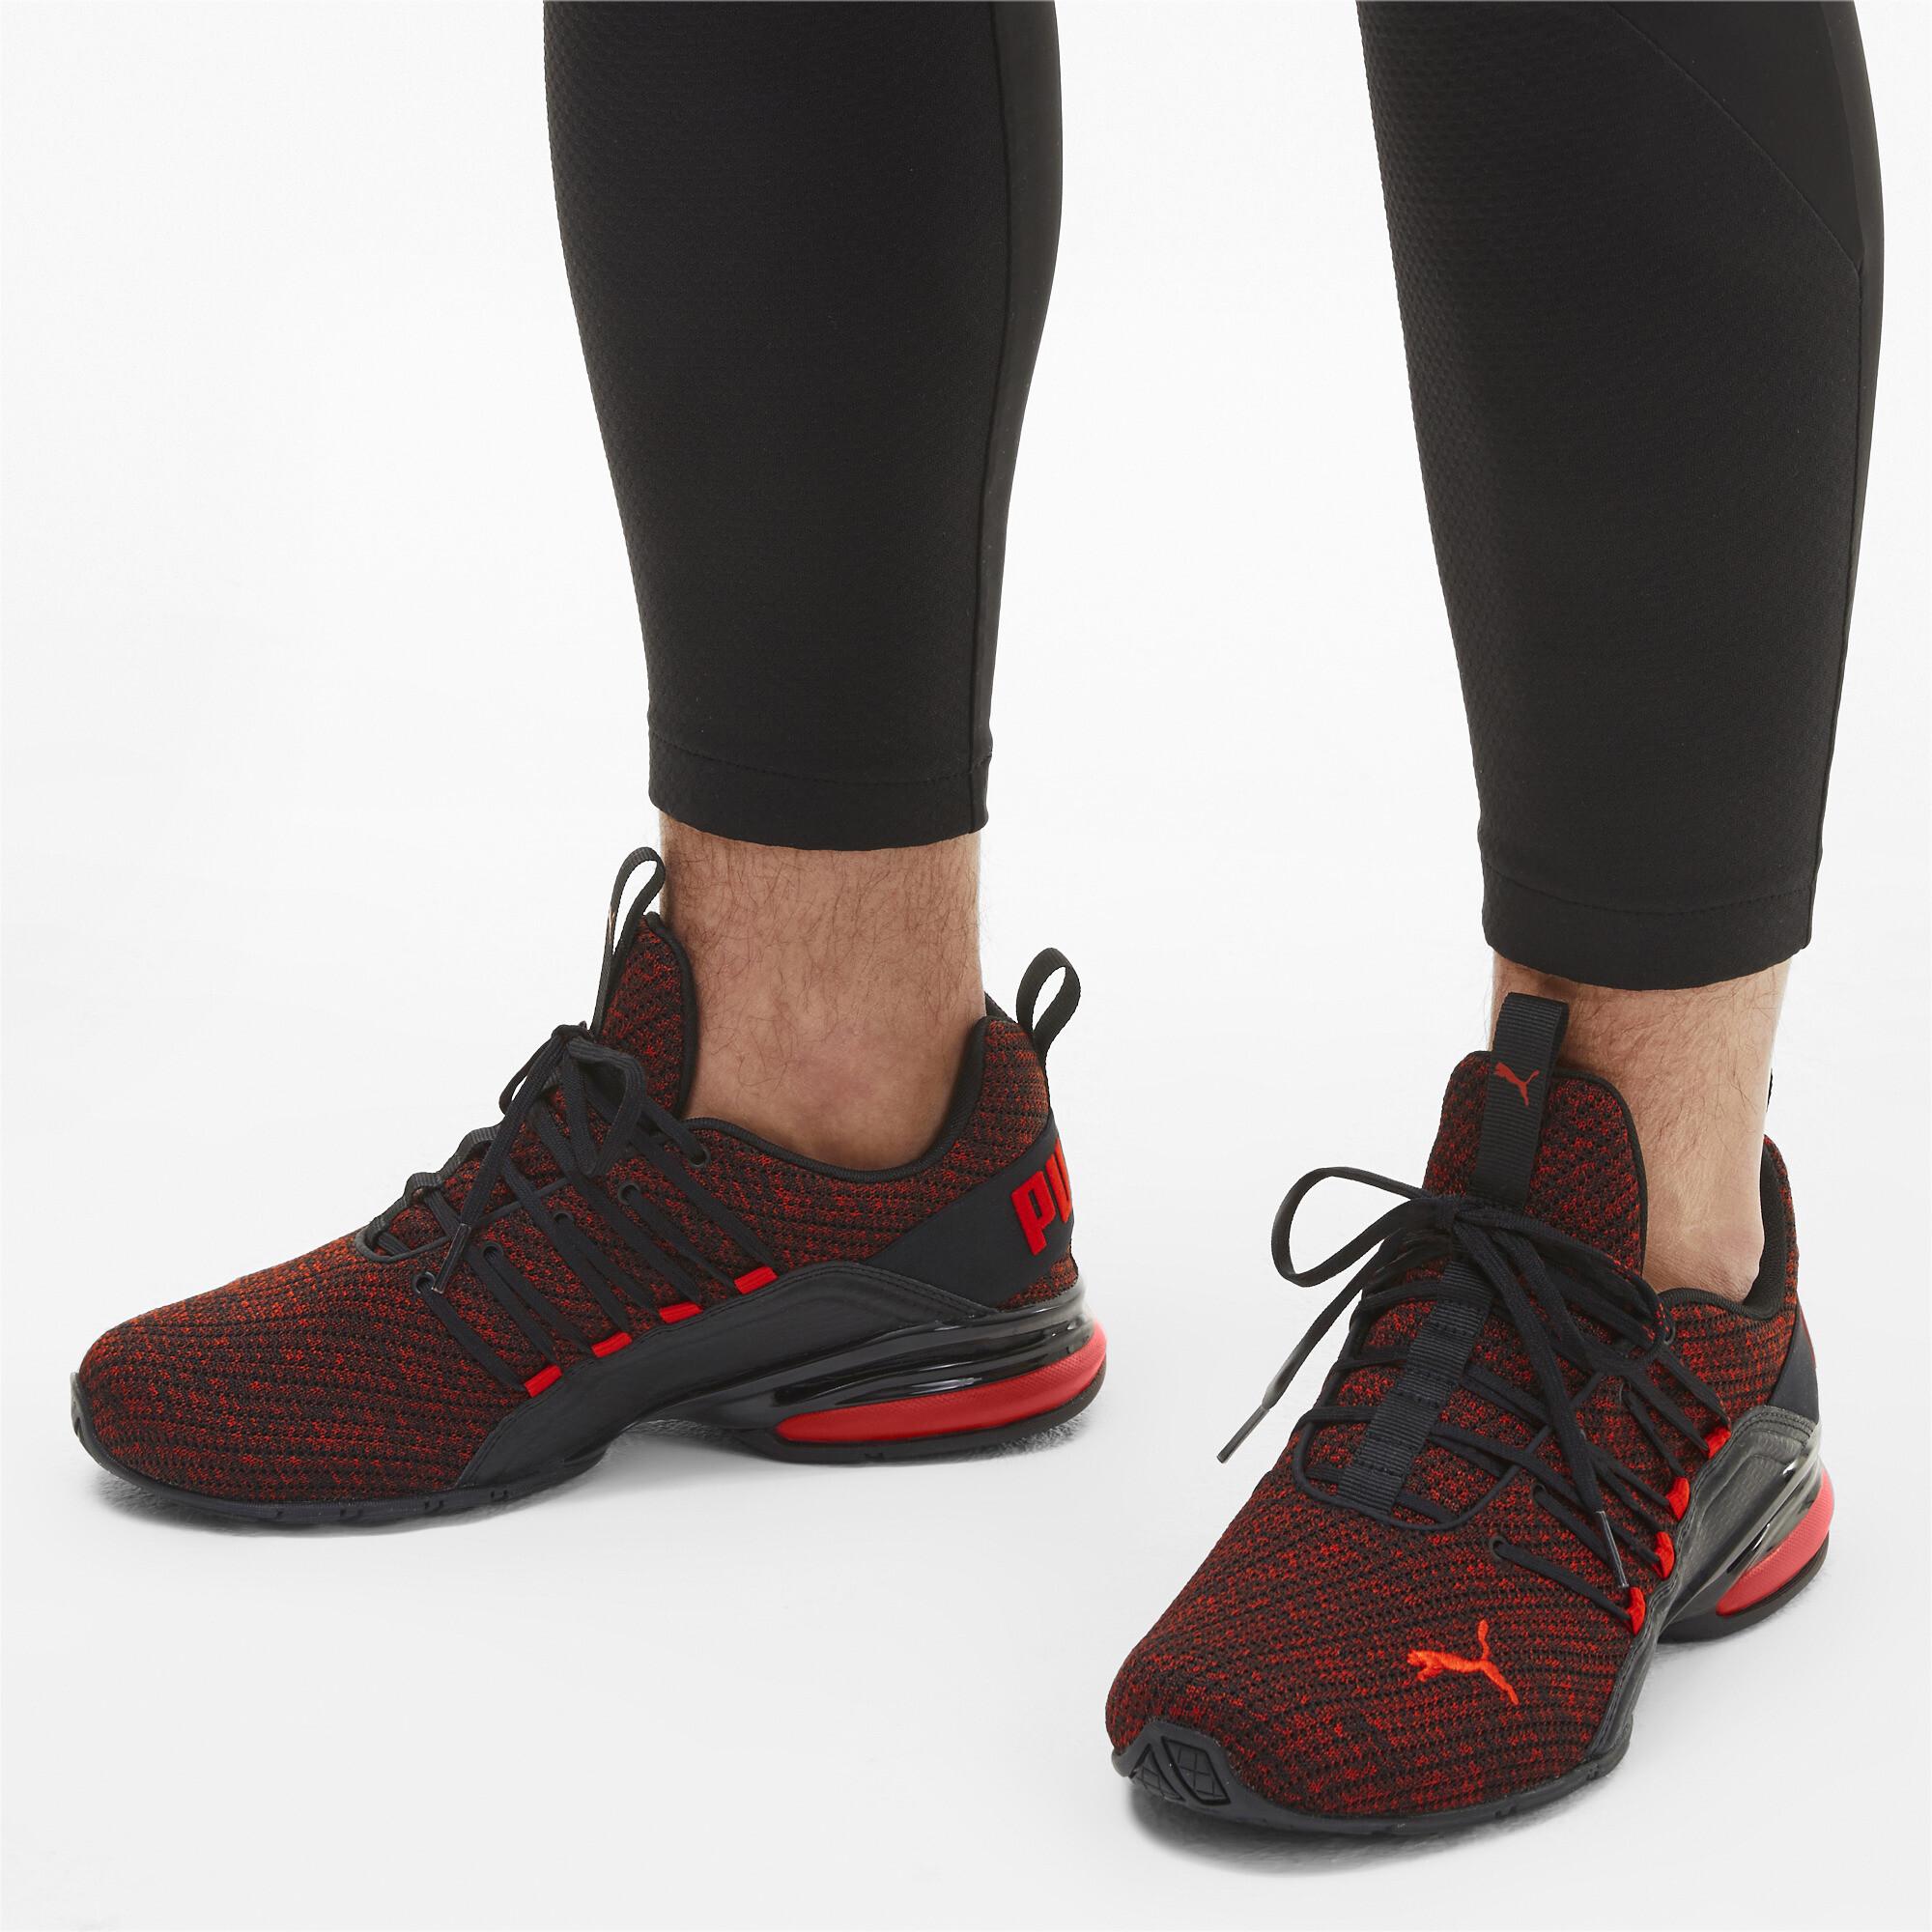 PUMA-Men-039-s-Axelion-Ultra-Running-Shoes thumbnail 5